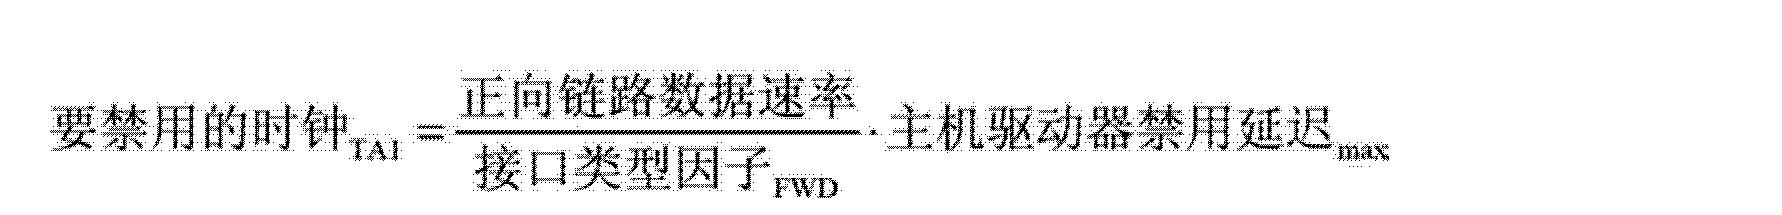 Figure CN102801595AD00821